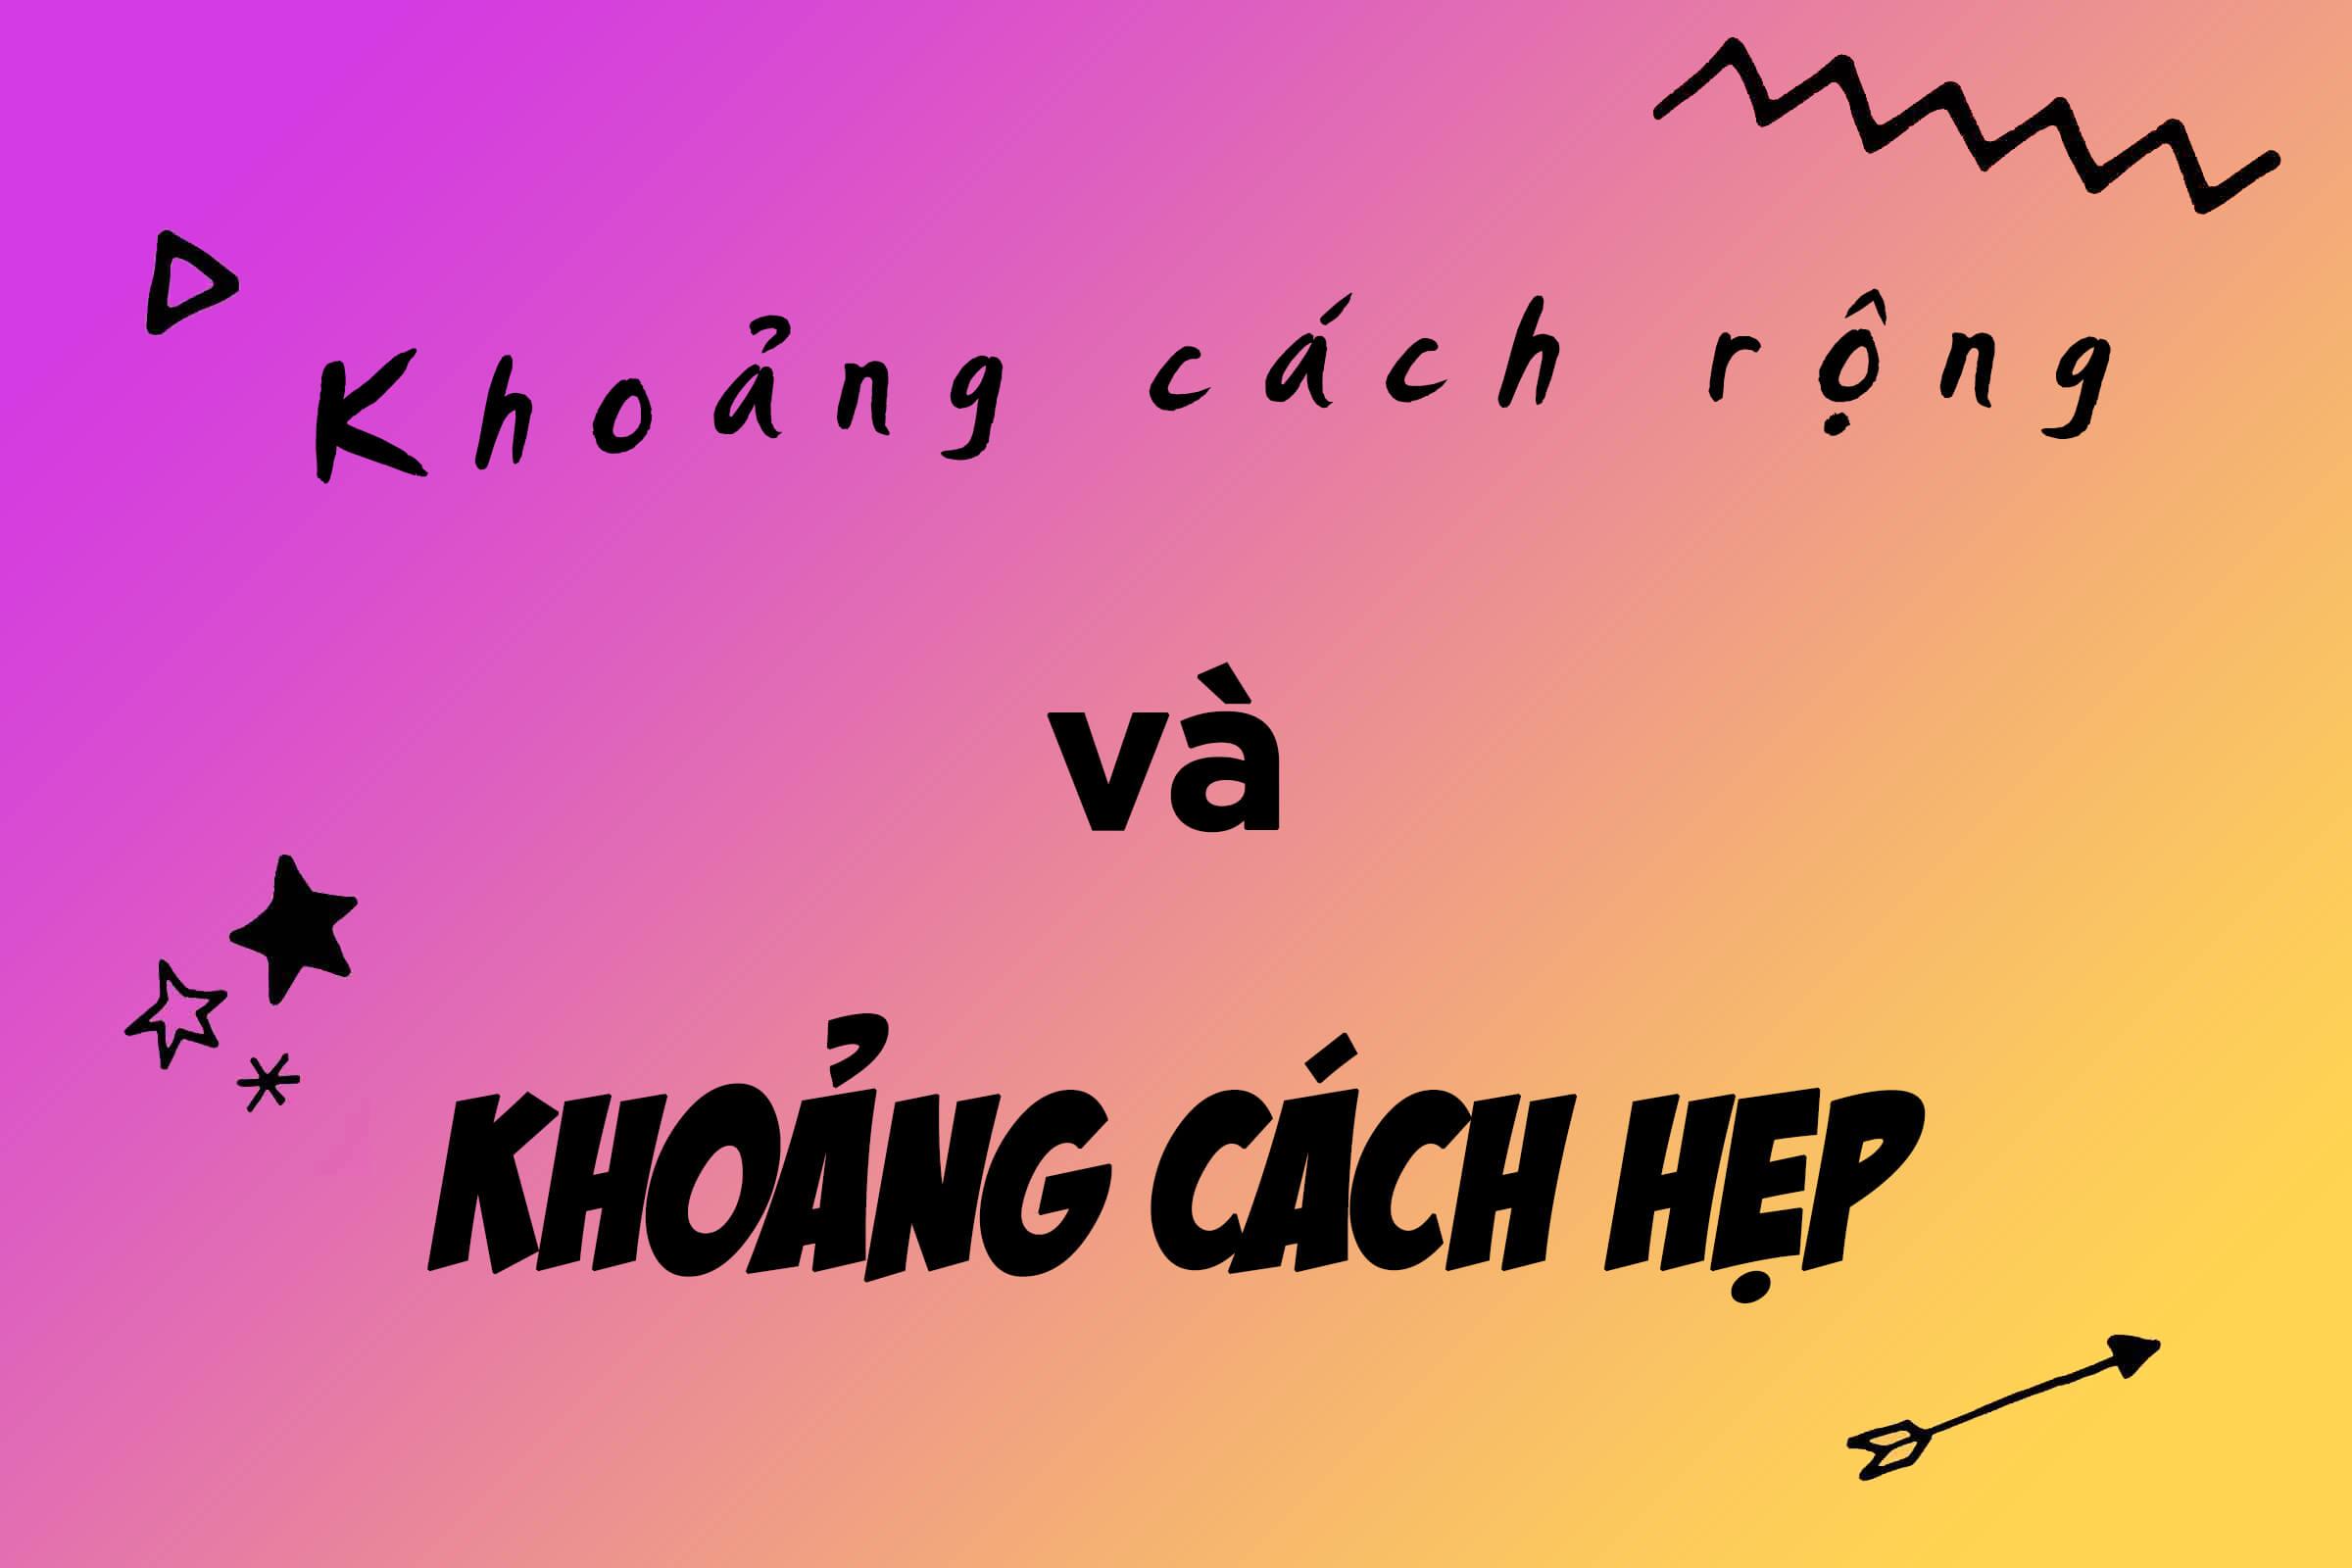 nhin-chu-doan-tinh-cach-huong-di-moi-giup-sep-doc-vi-nhan-vien-1